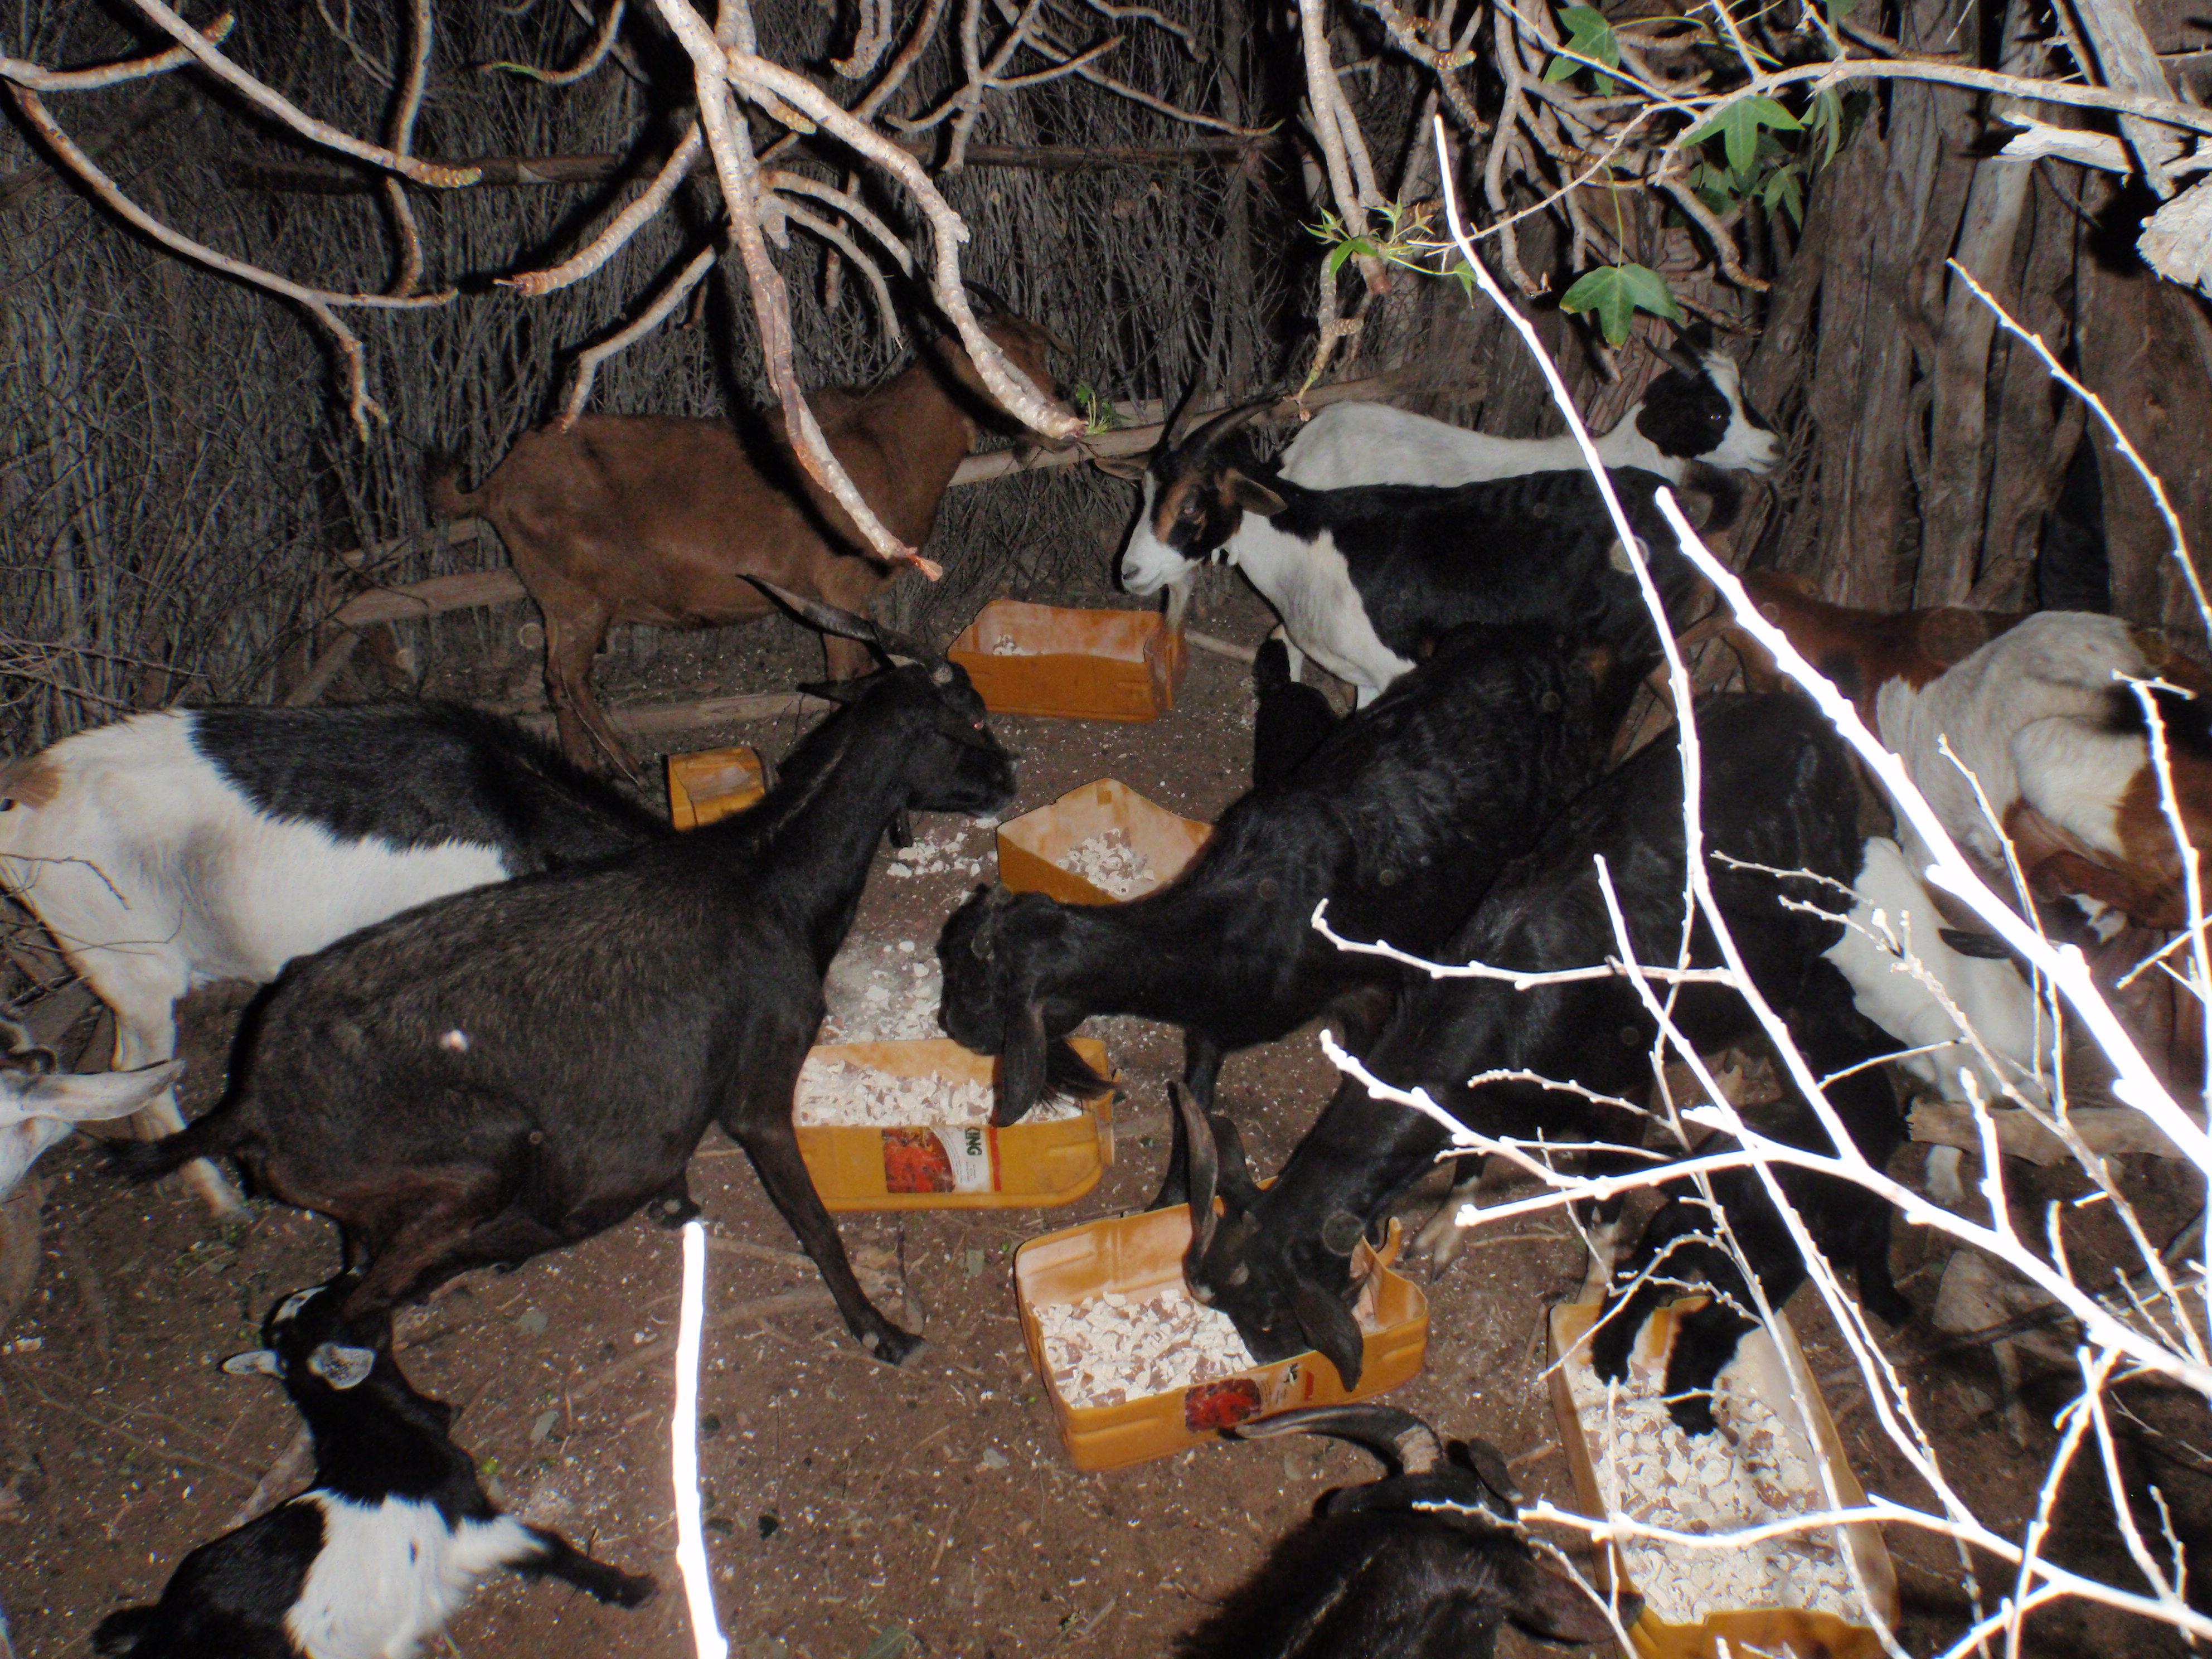 Chèvres prenant la ration quotidienne de manioc©J. Randriamalala